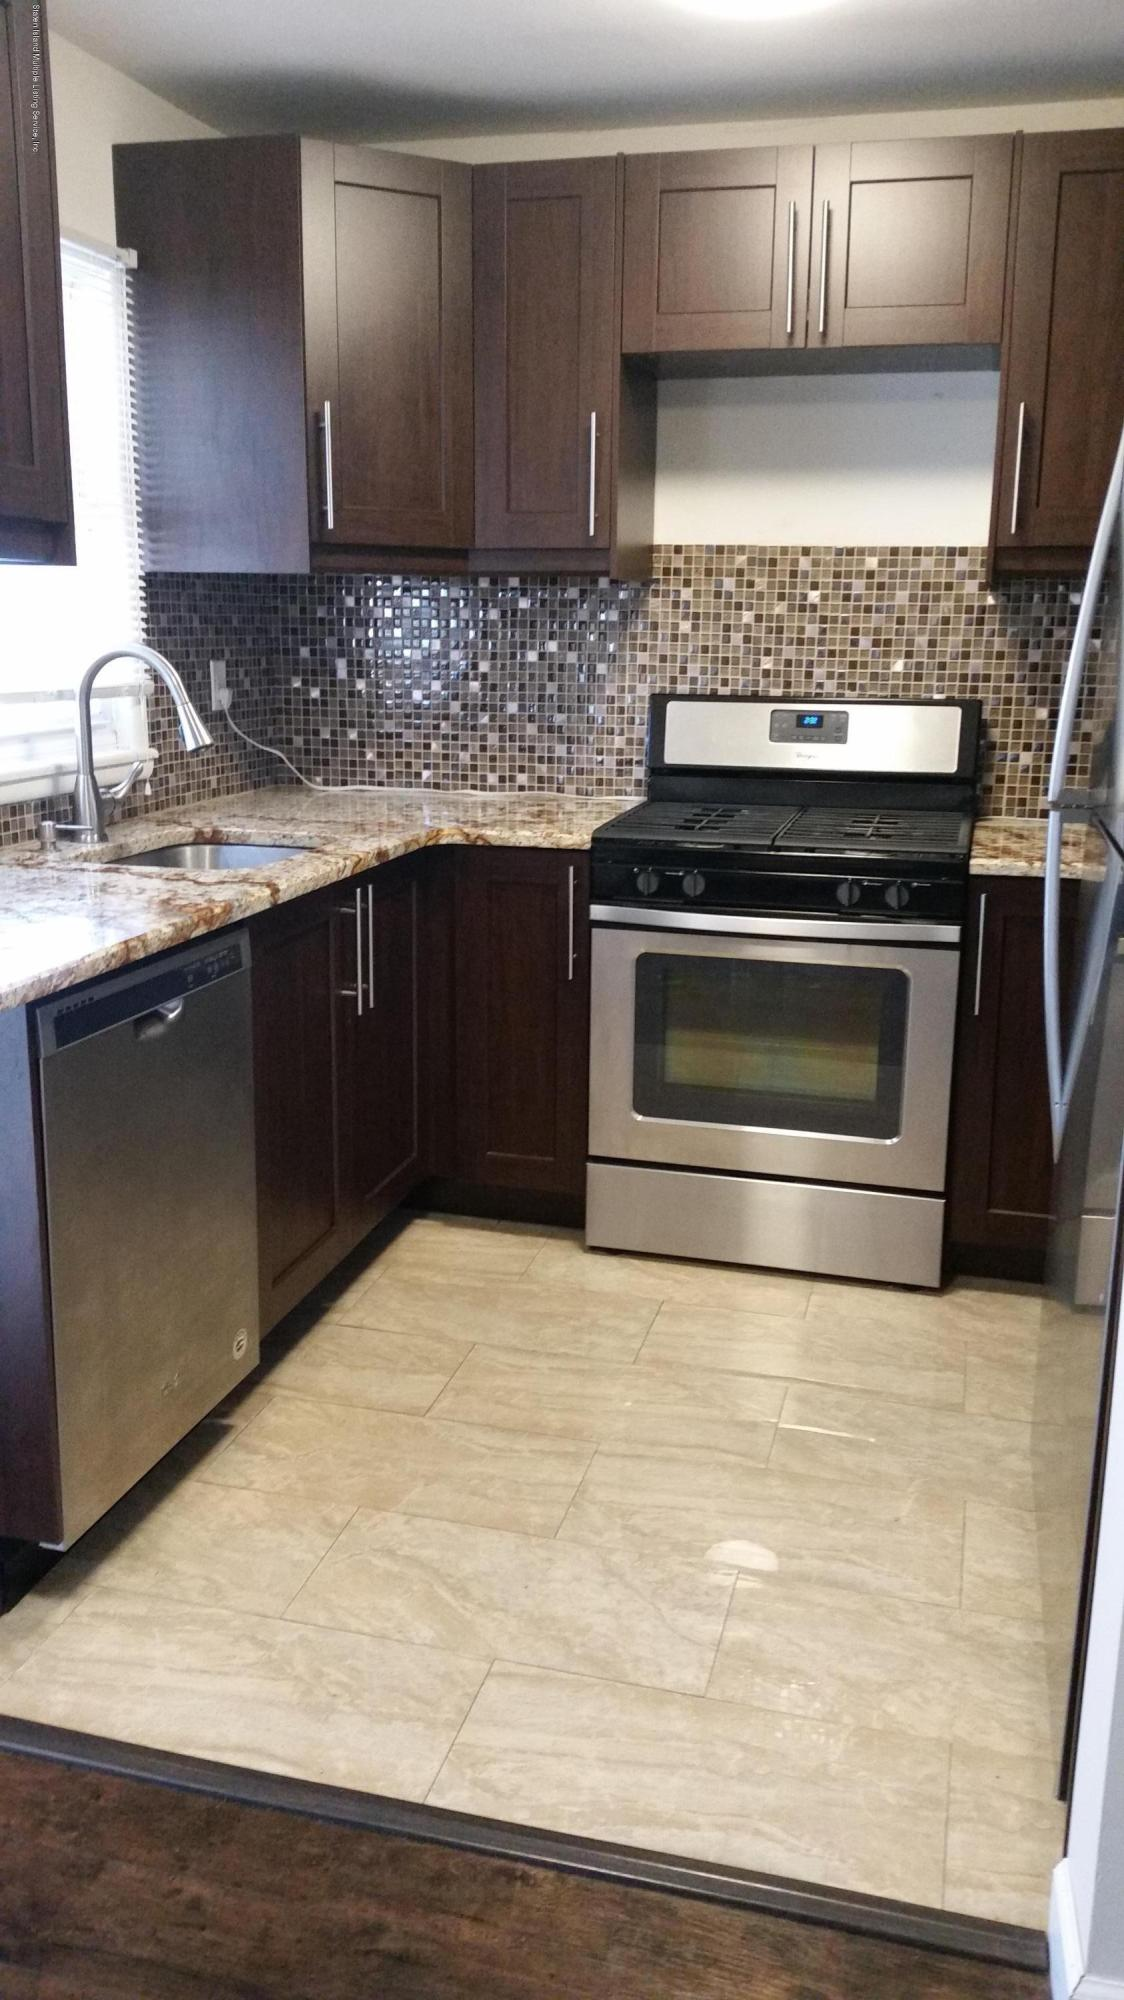 Single Family - Semi-Attached 319 Finley Avenue  Staten Island, NY 10306, MLS-1124845-4